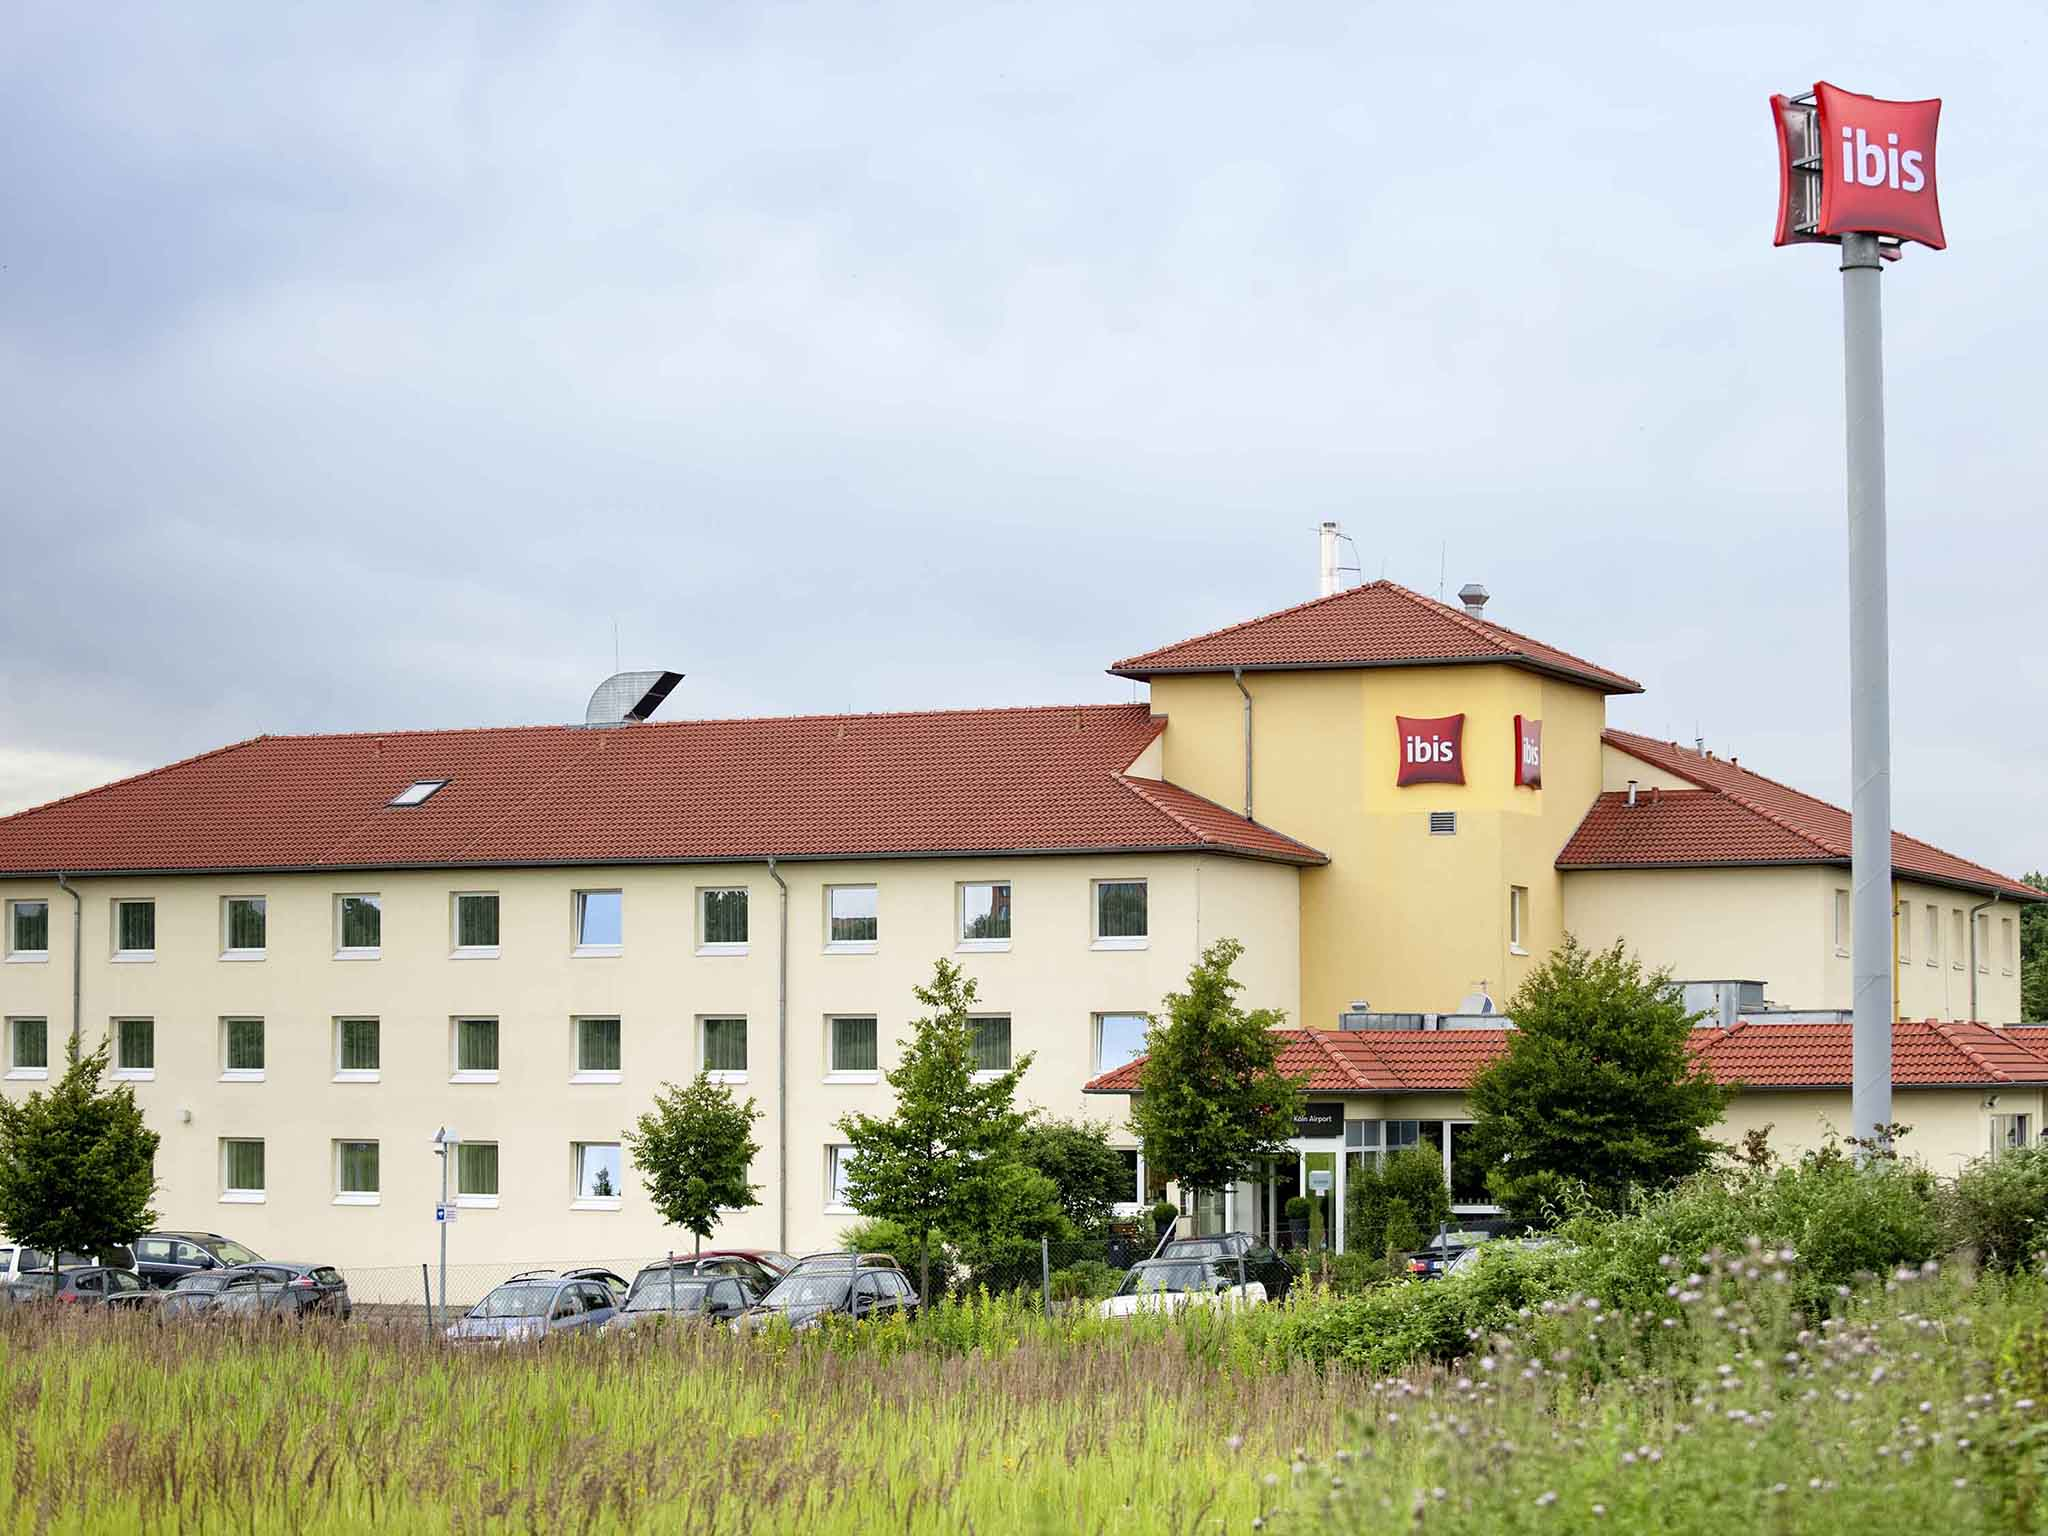 فندق - إيبيس ibis كولن إيربورت